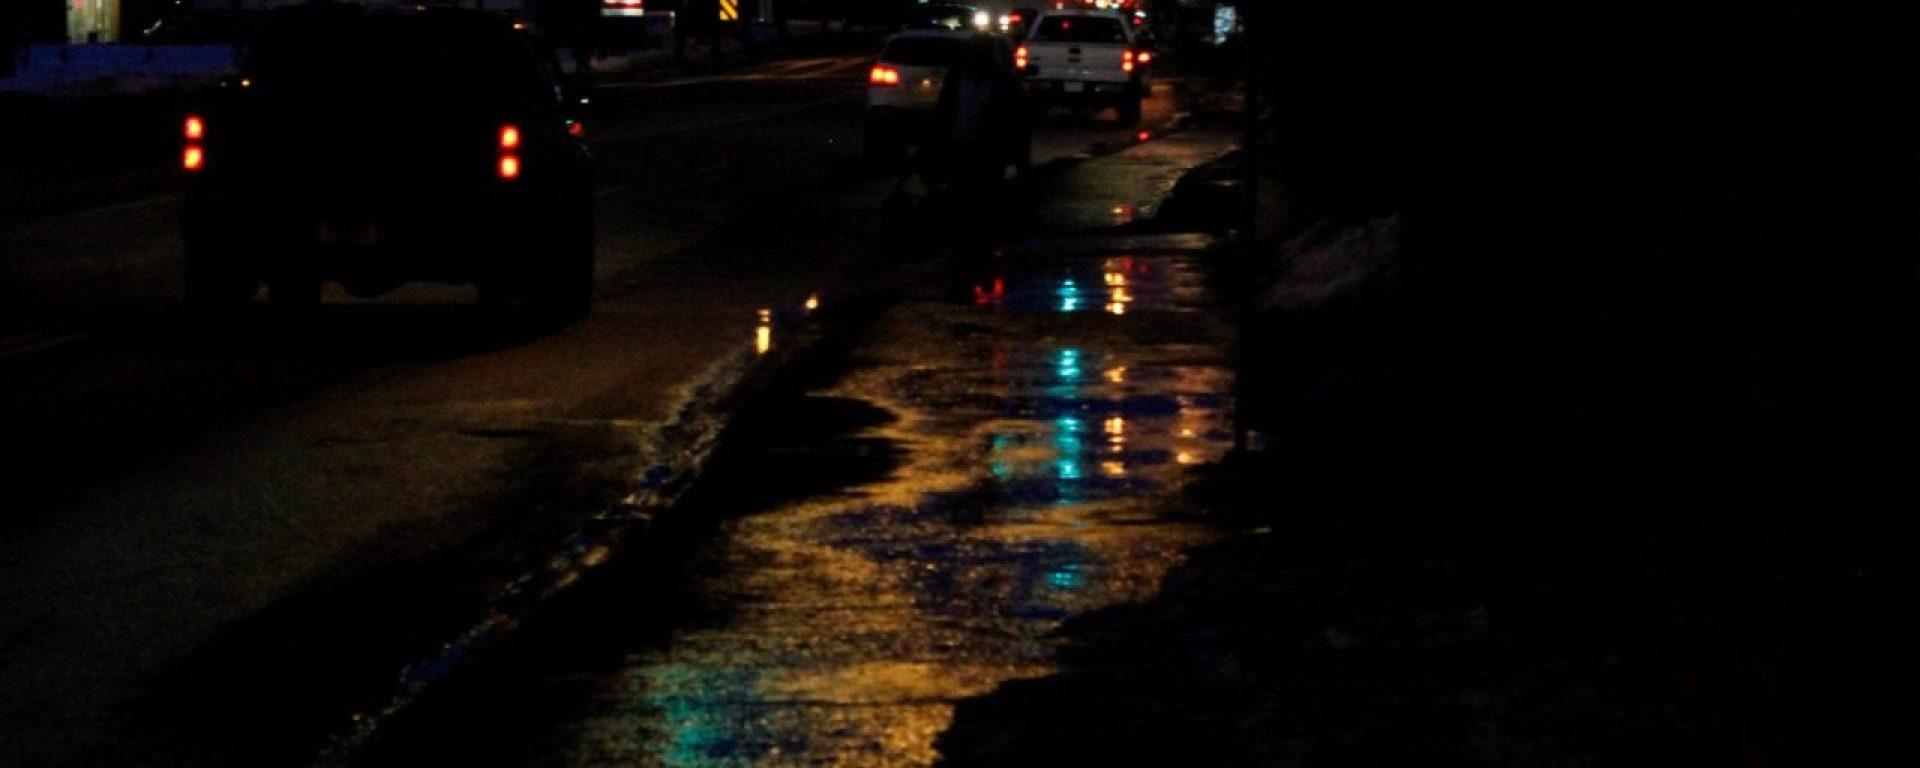 Edmonton's nightlife | Switching Styles